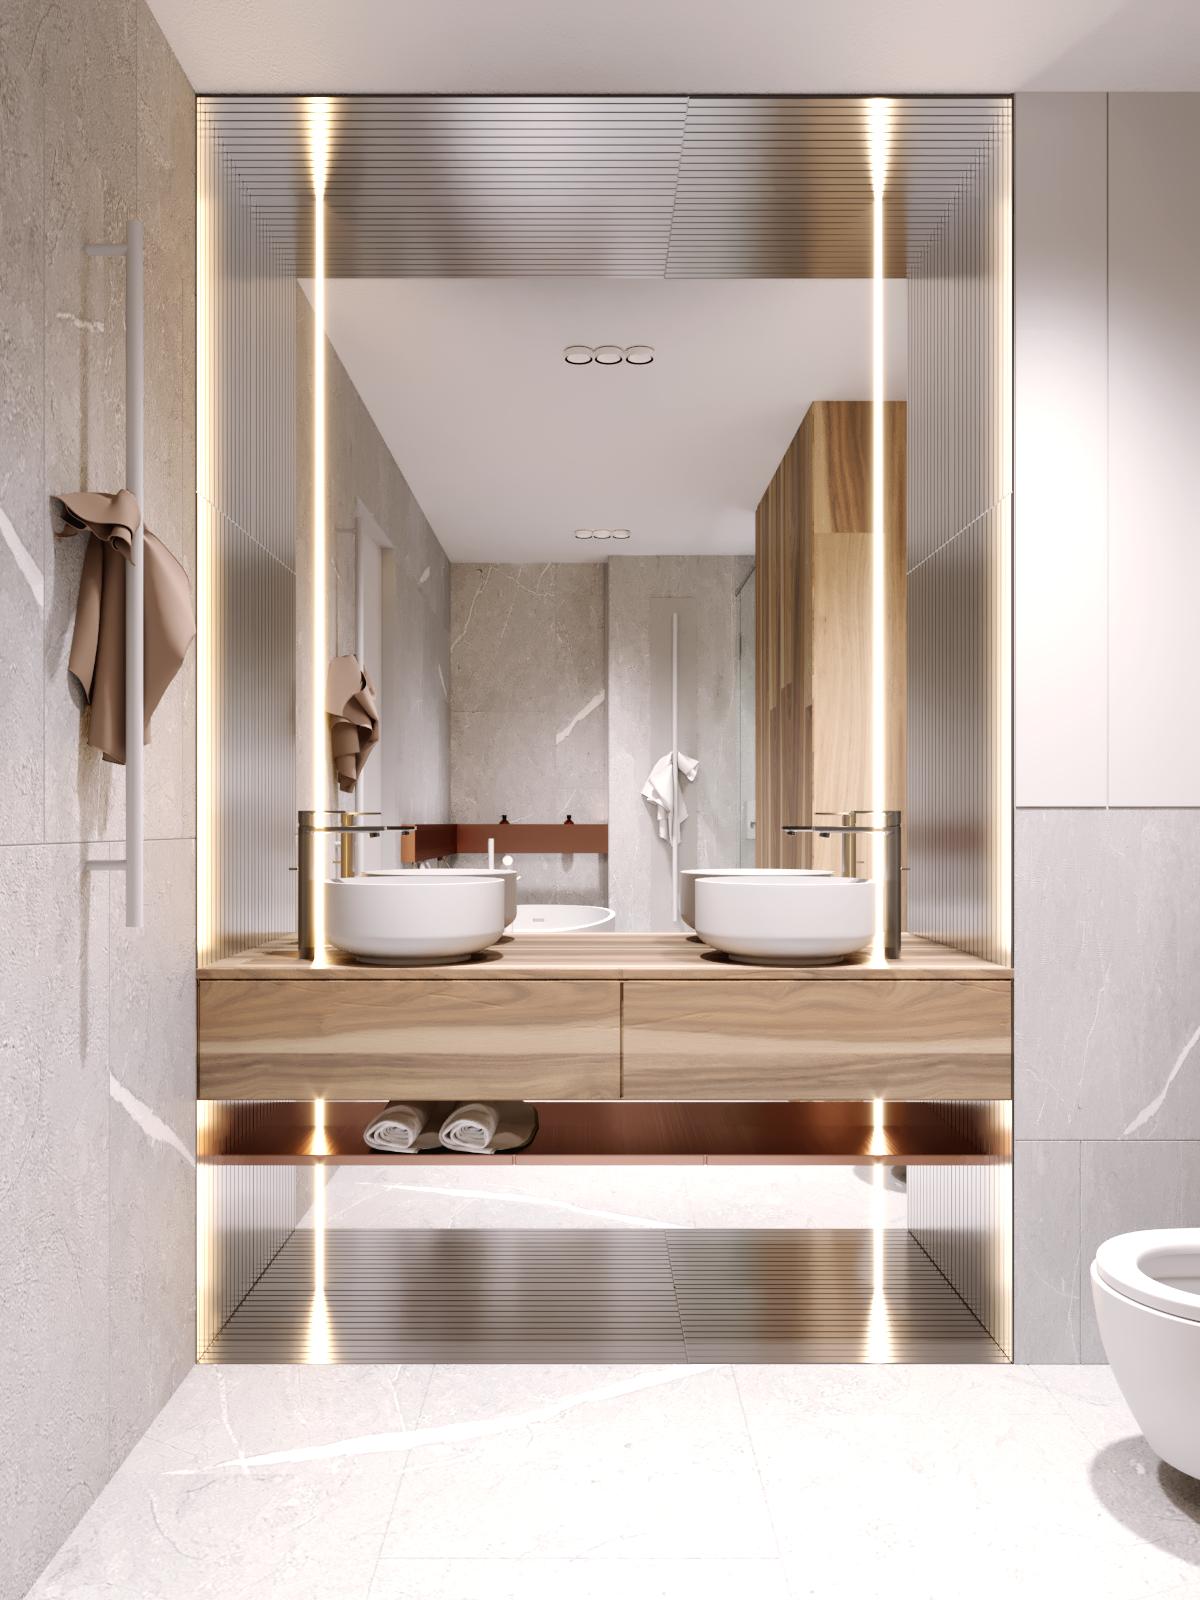 Cocoon Bathroom Vanity Design Inspiration Modern Washbasins High End Stainless Steel T Bathroom Interior Design Bathroom Vanity Designs Top Bathroom Design